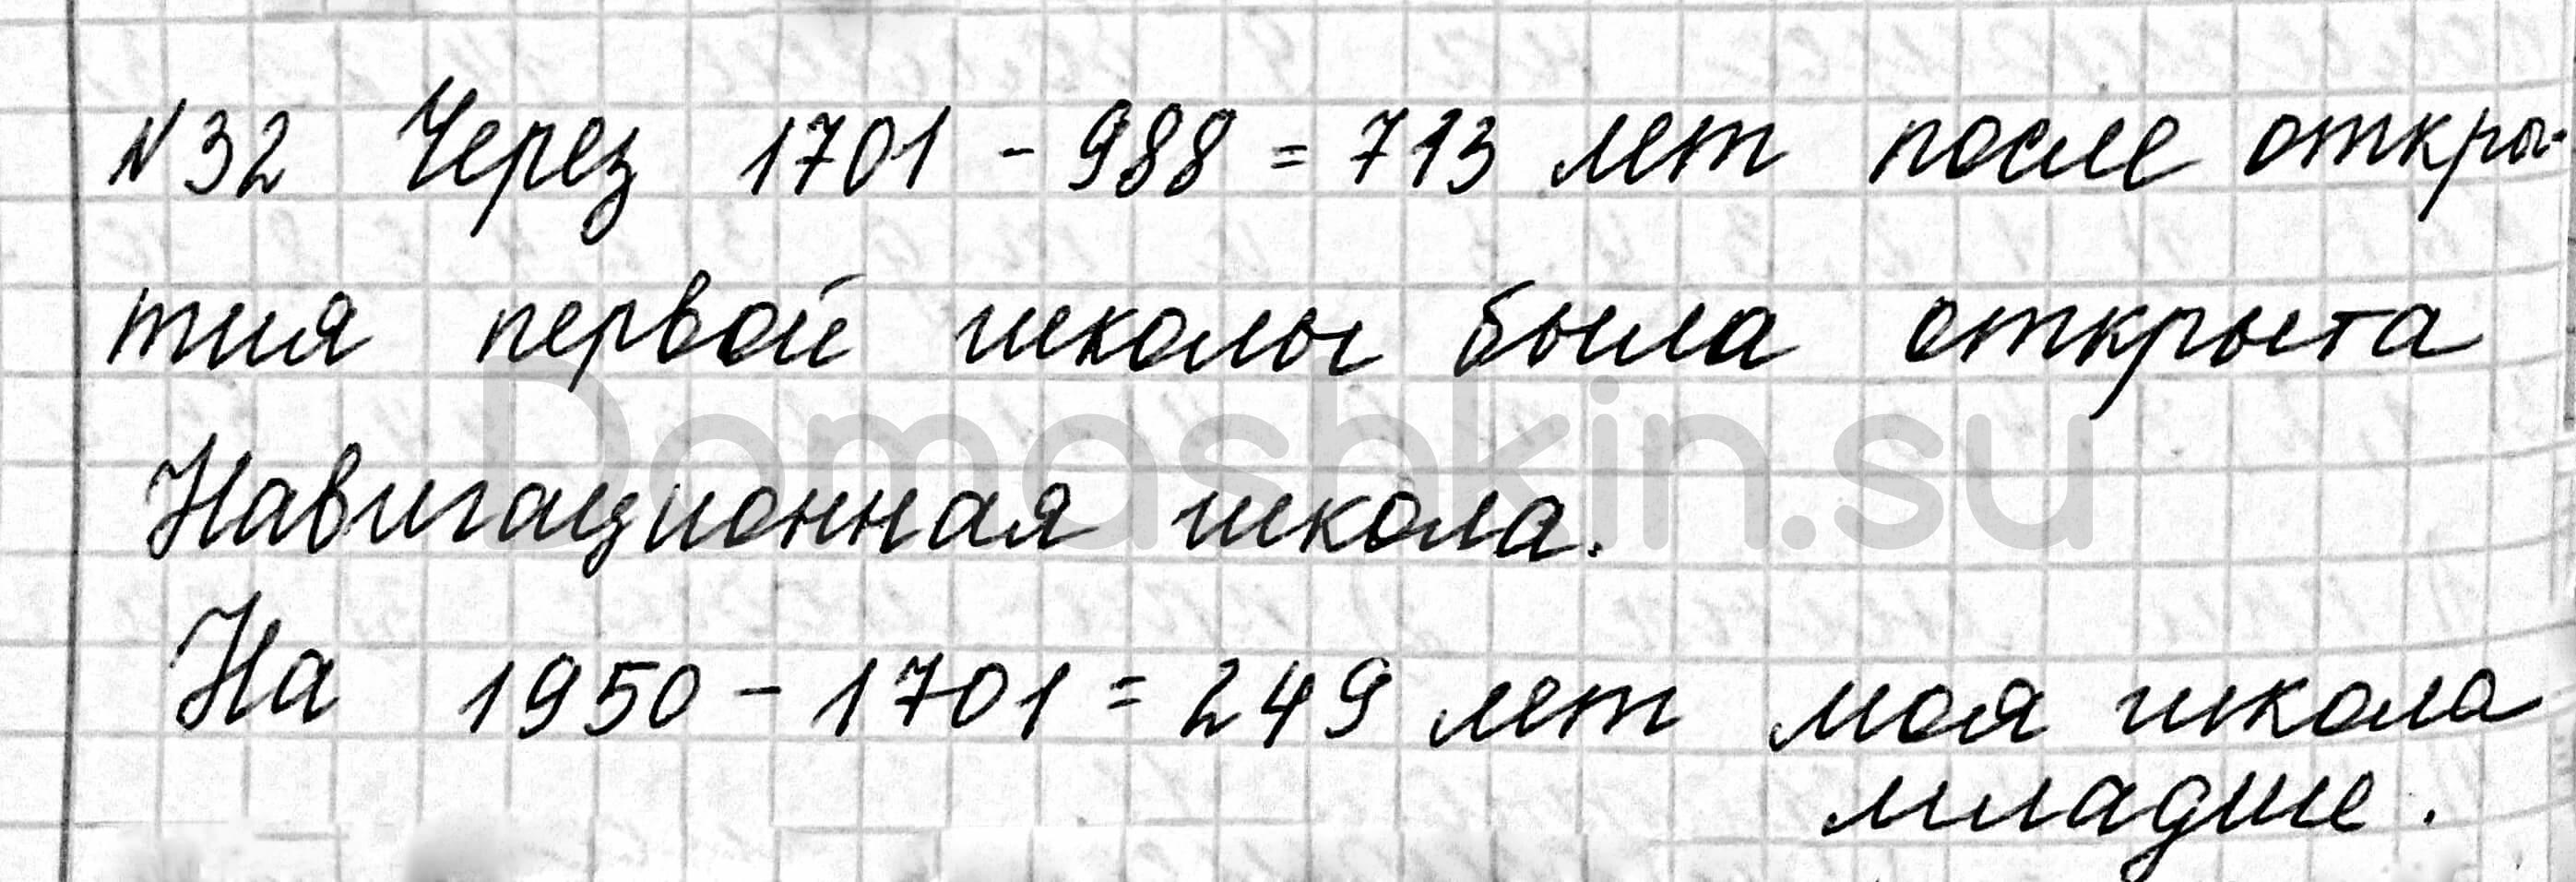 Математика 6 класс учебник Мерзляк номер 32 решение